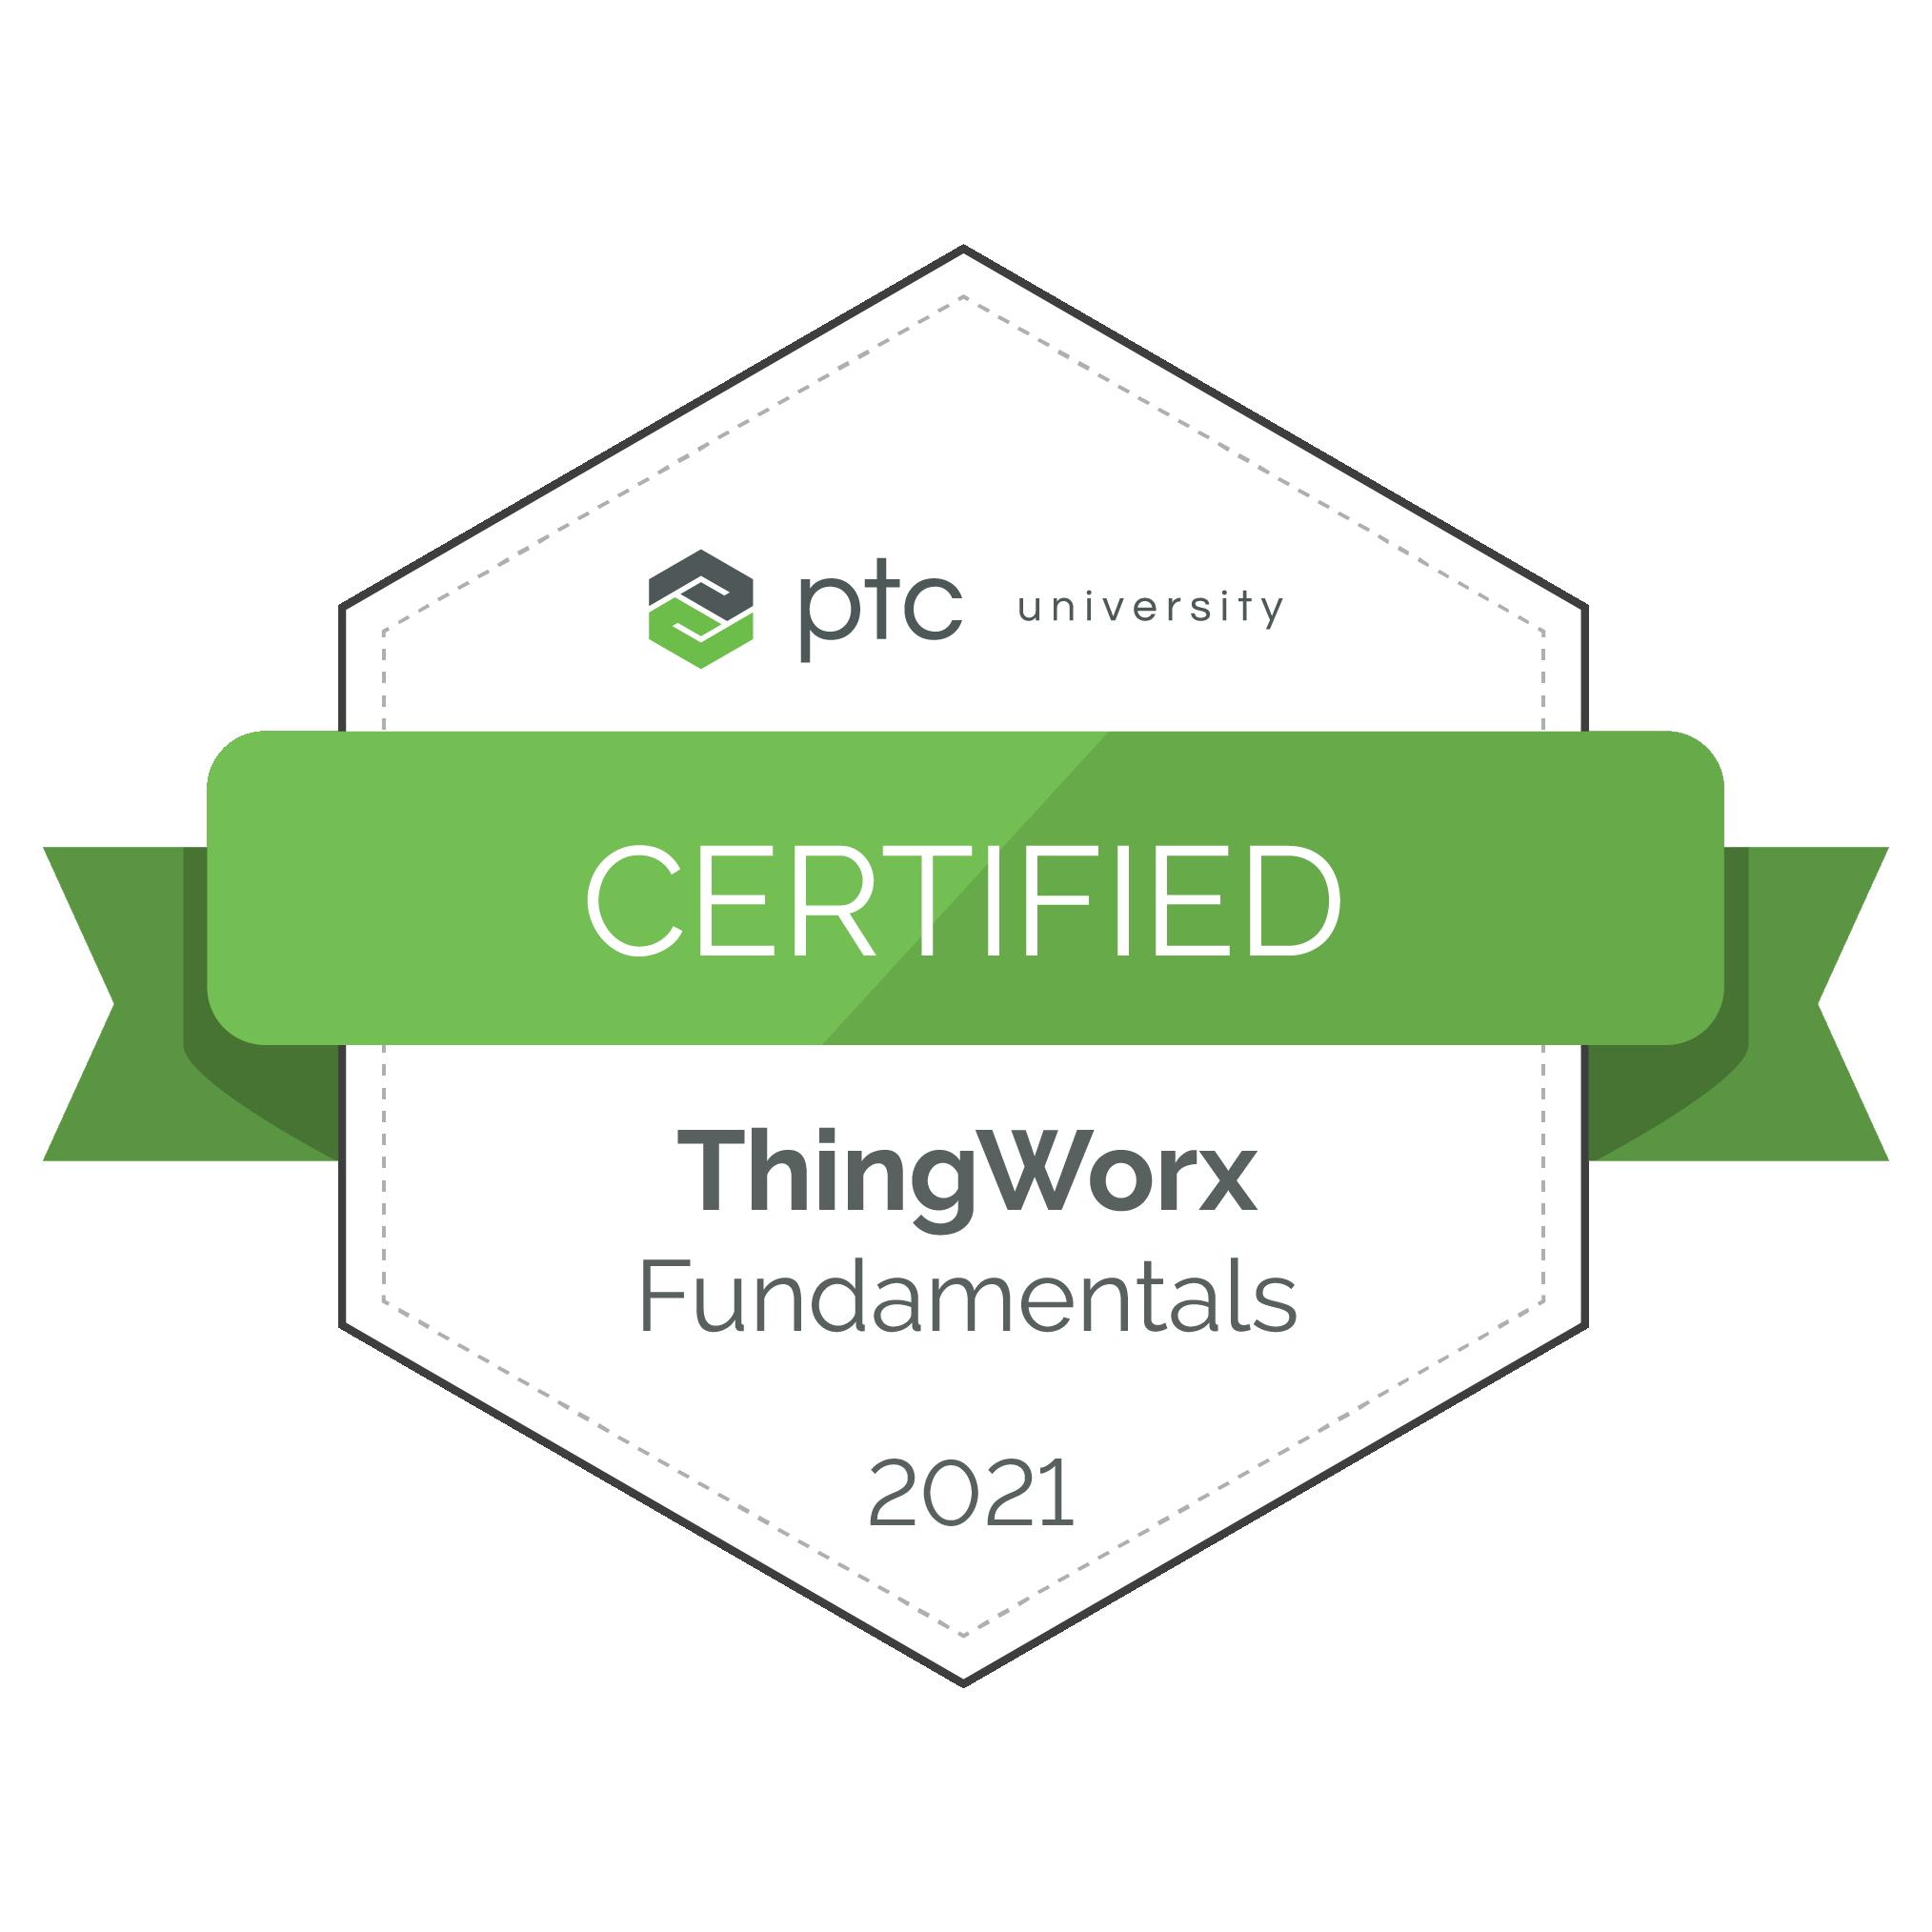 ThingWorx Fundamentals Certification 2021